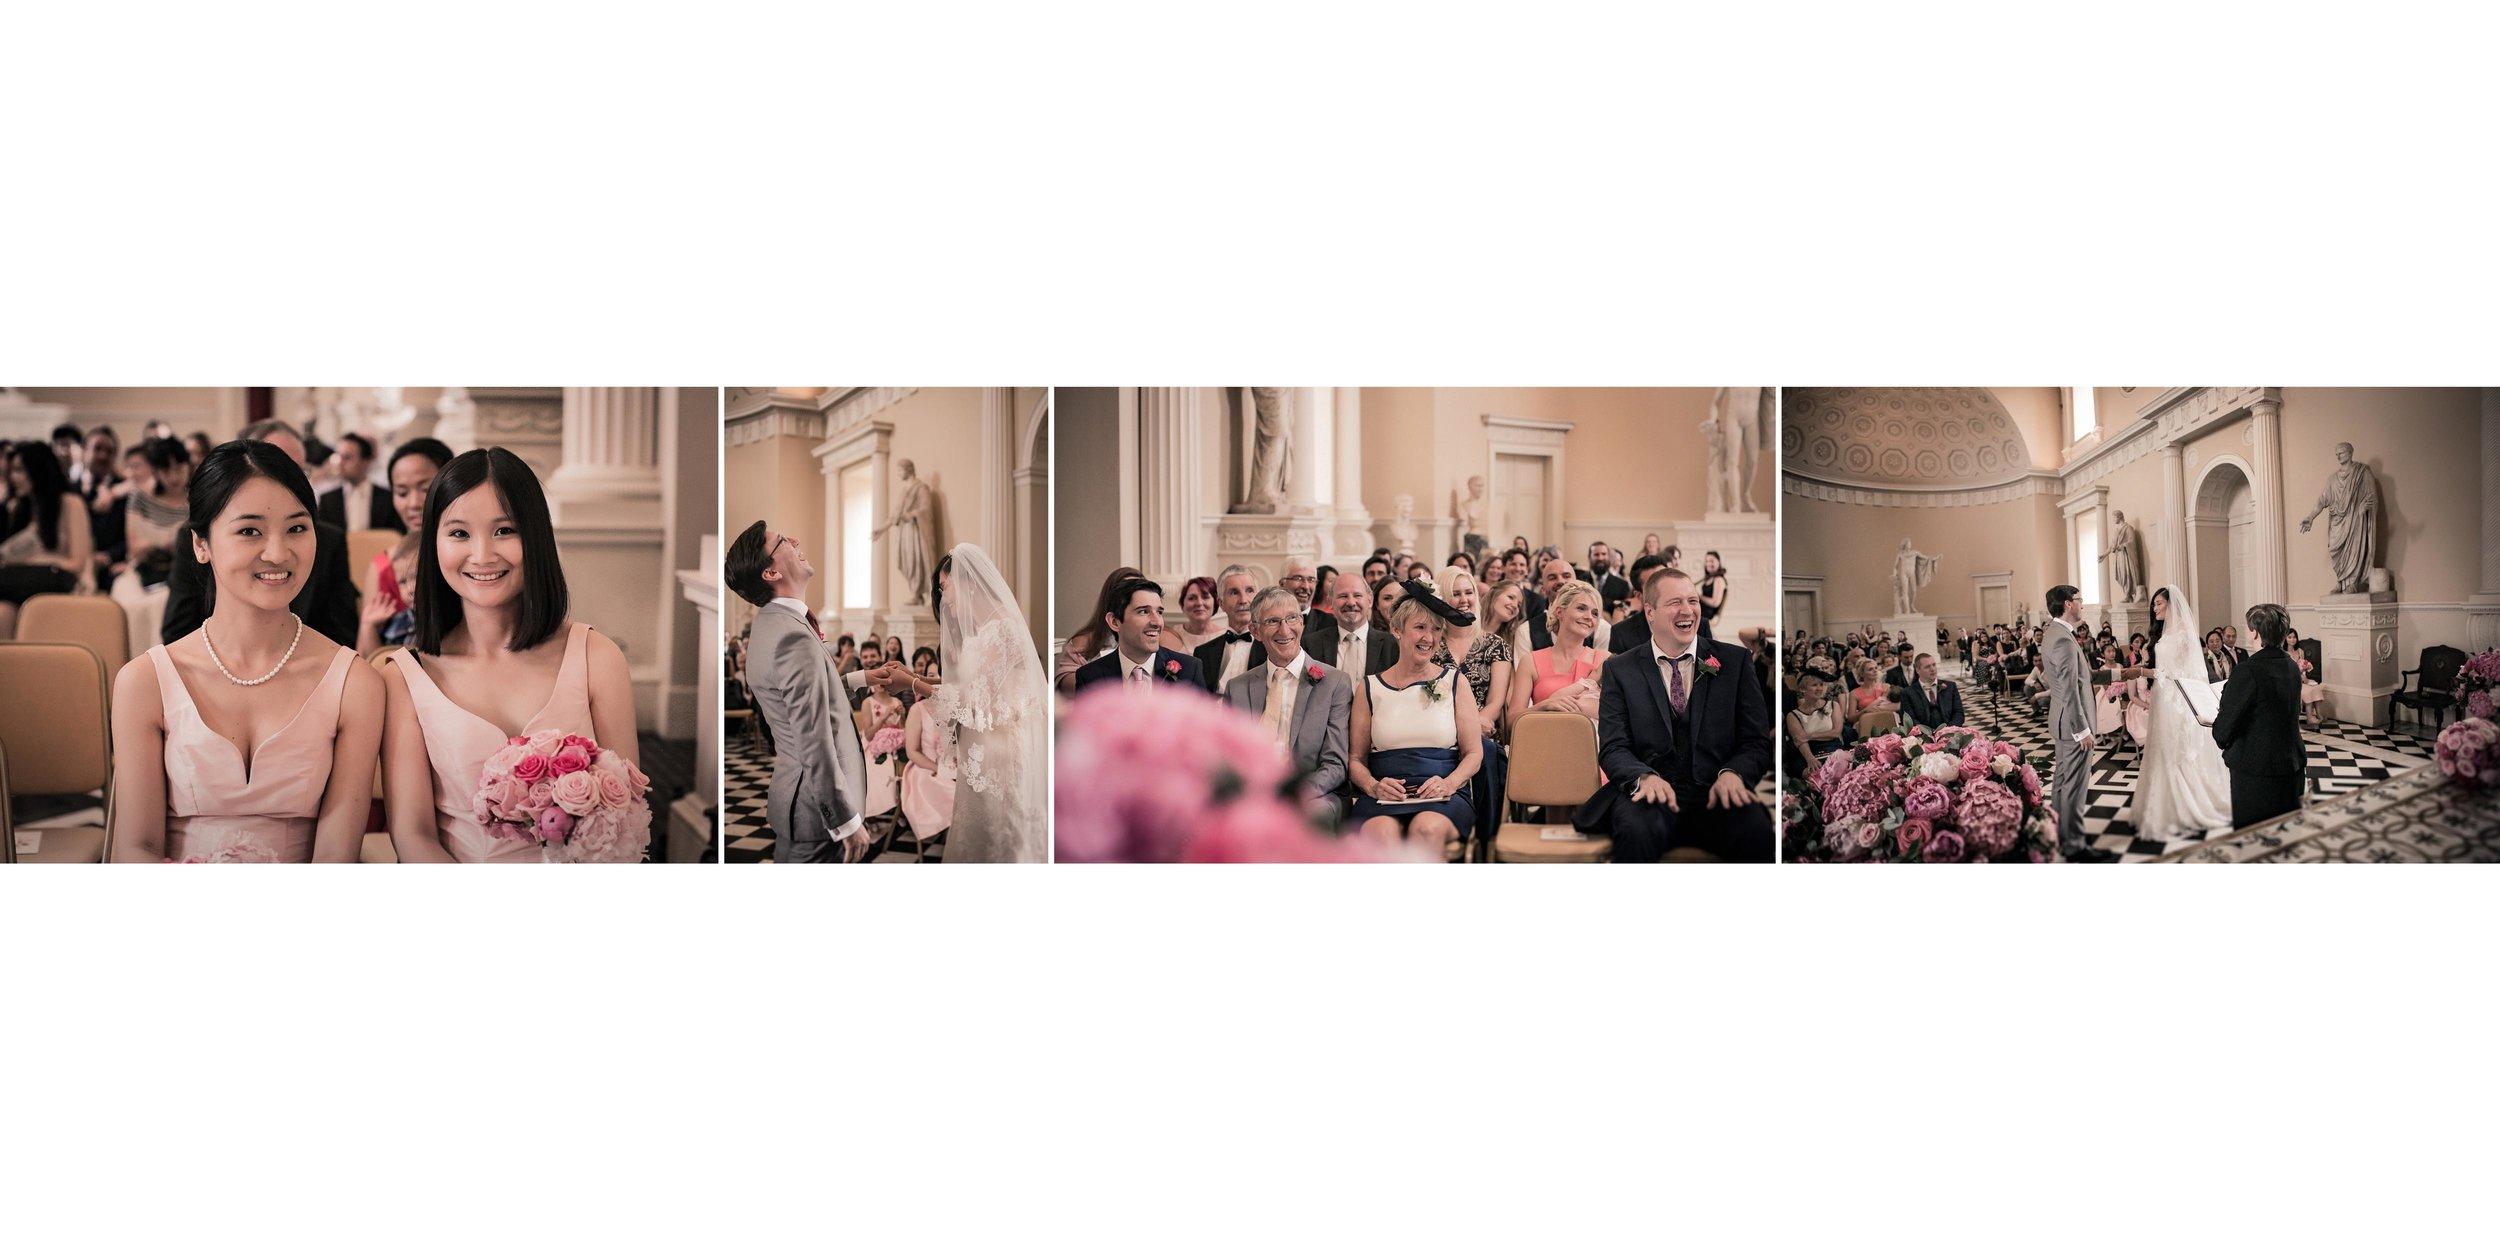 wedding_photographer_surrey_27.jpg